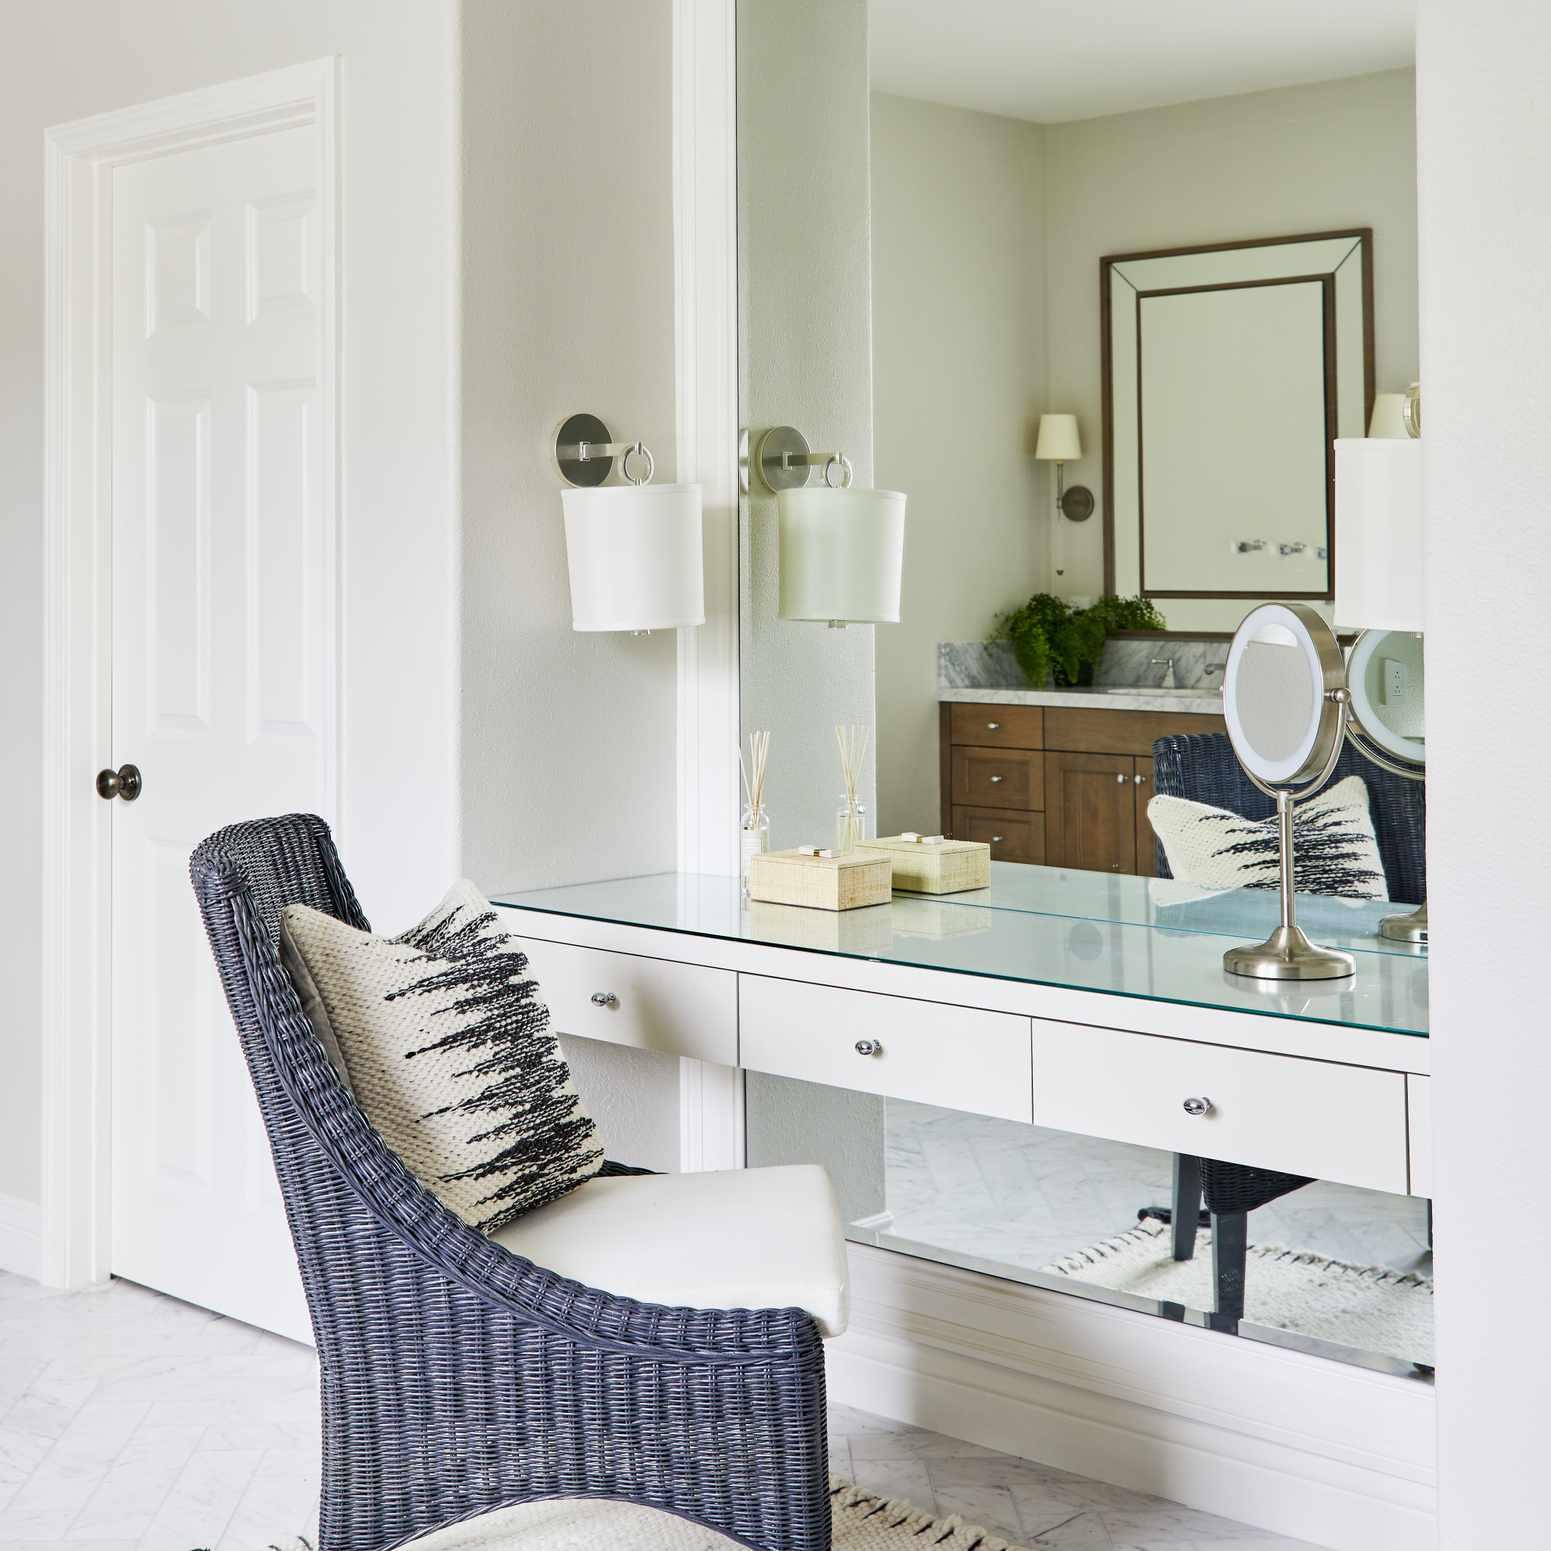 Elegant vanity space with large wicker chair.